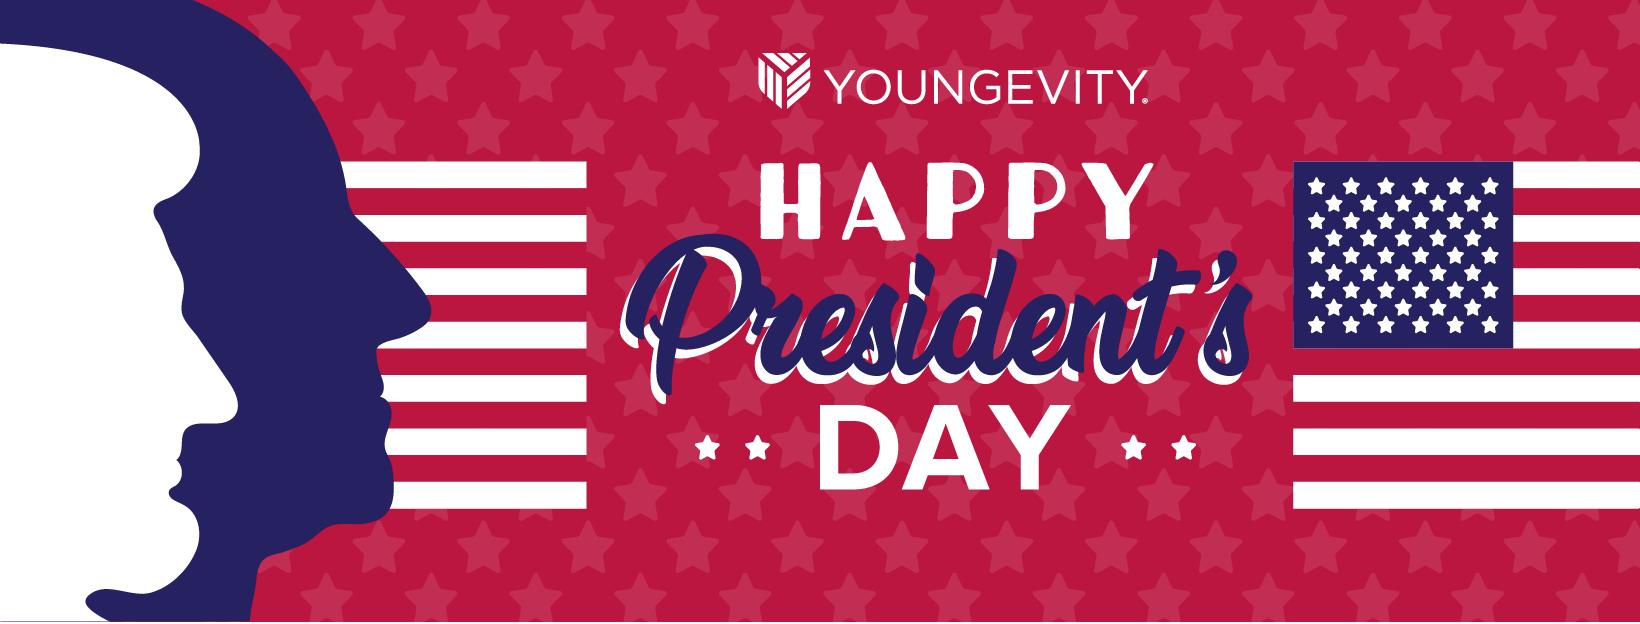 Presidents Day 02 15 21 Happy Presidents Day Fb Banner Presidents Day